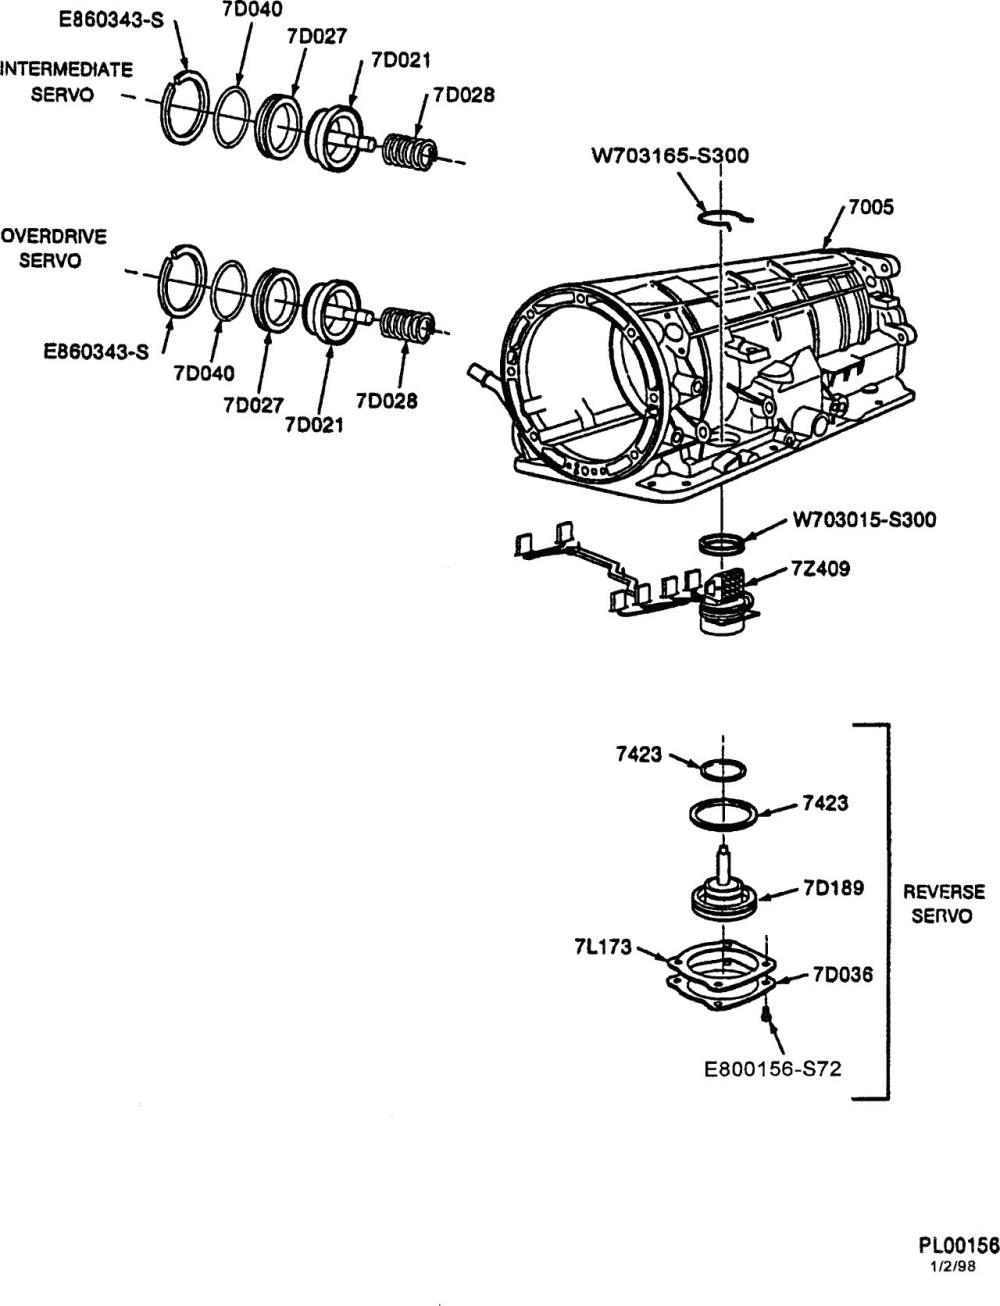 medium resolution of 2002 ford ranger parts diagram 4r70w transmission diagram wiring 1996 ford explorer transmission diagram 4r55e transmission